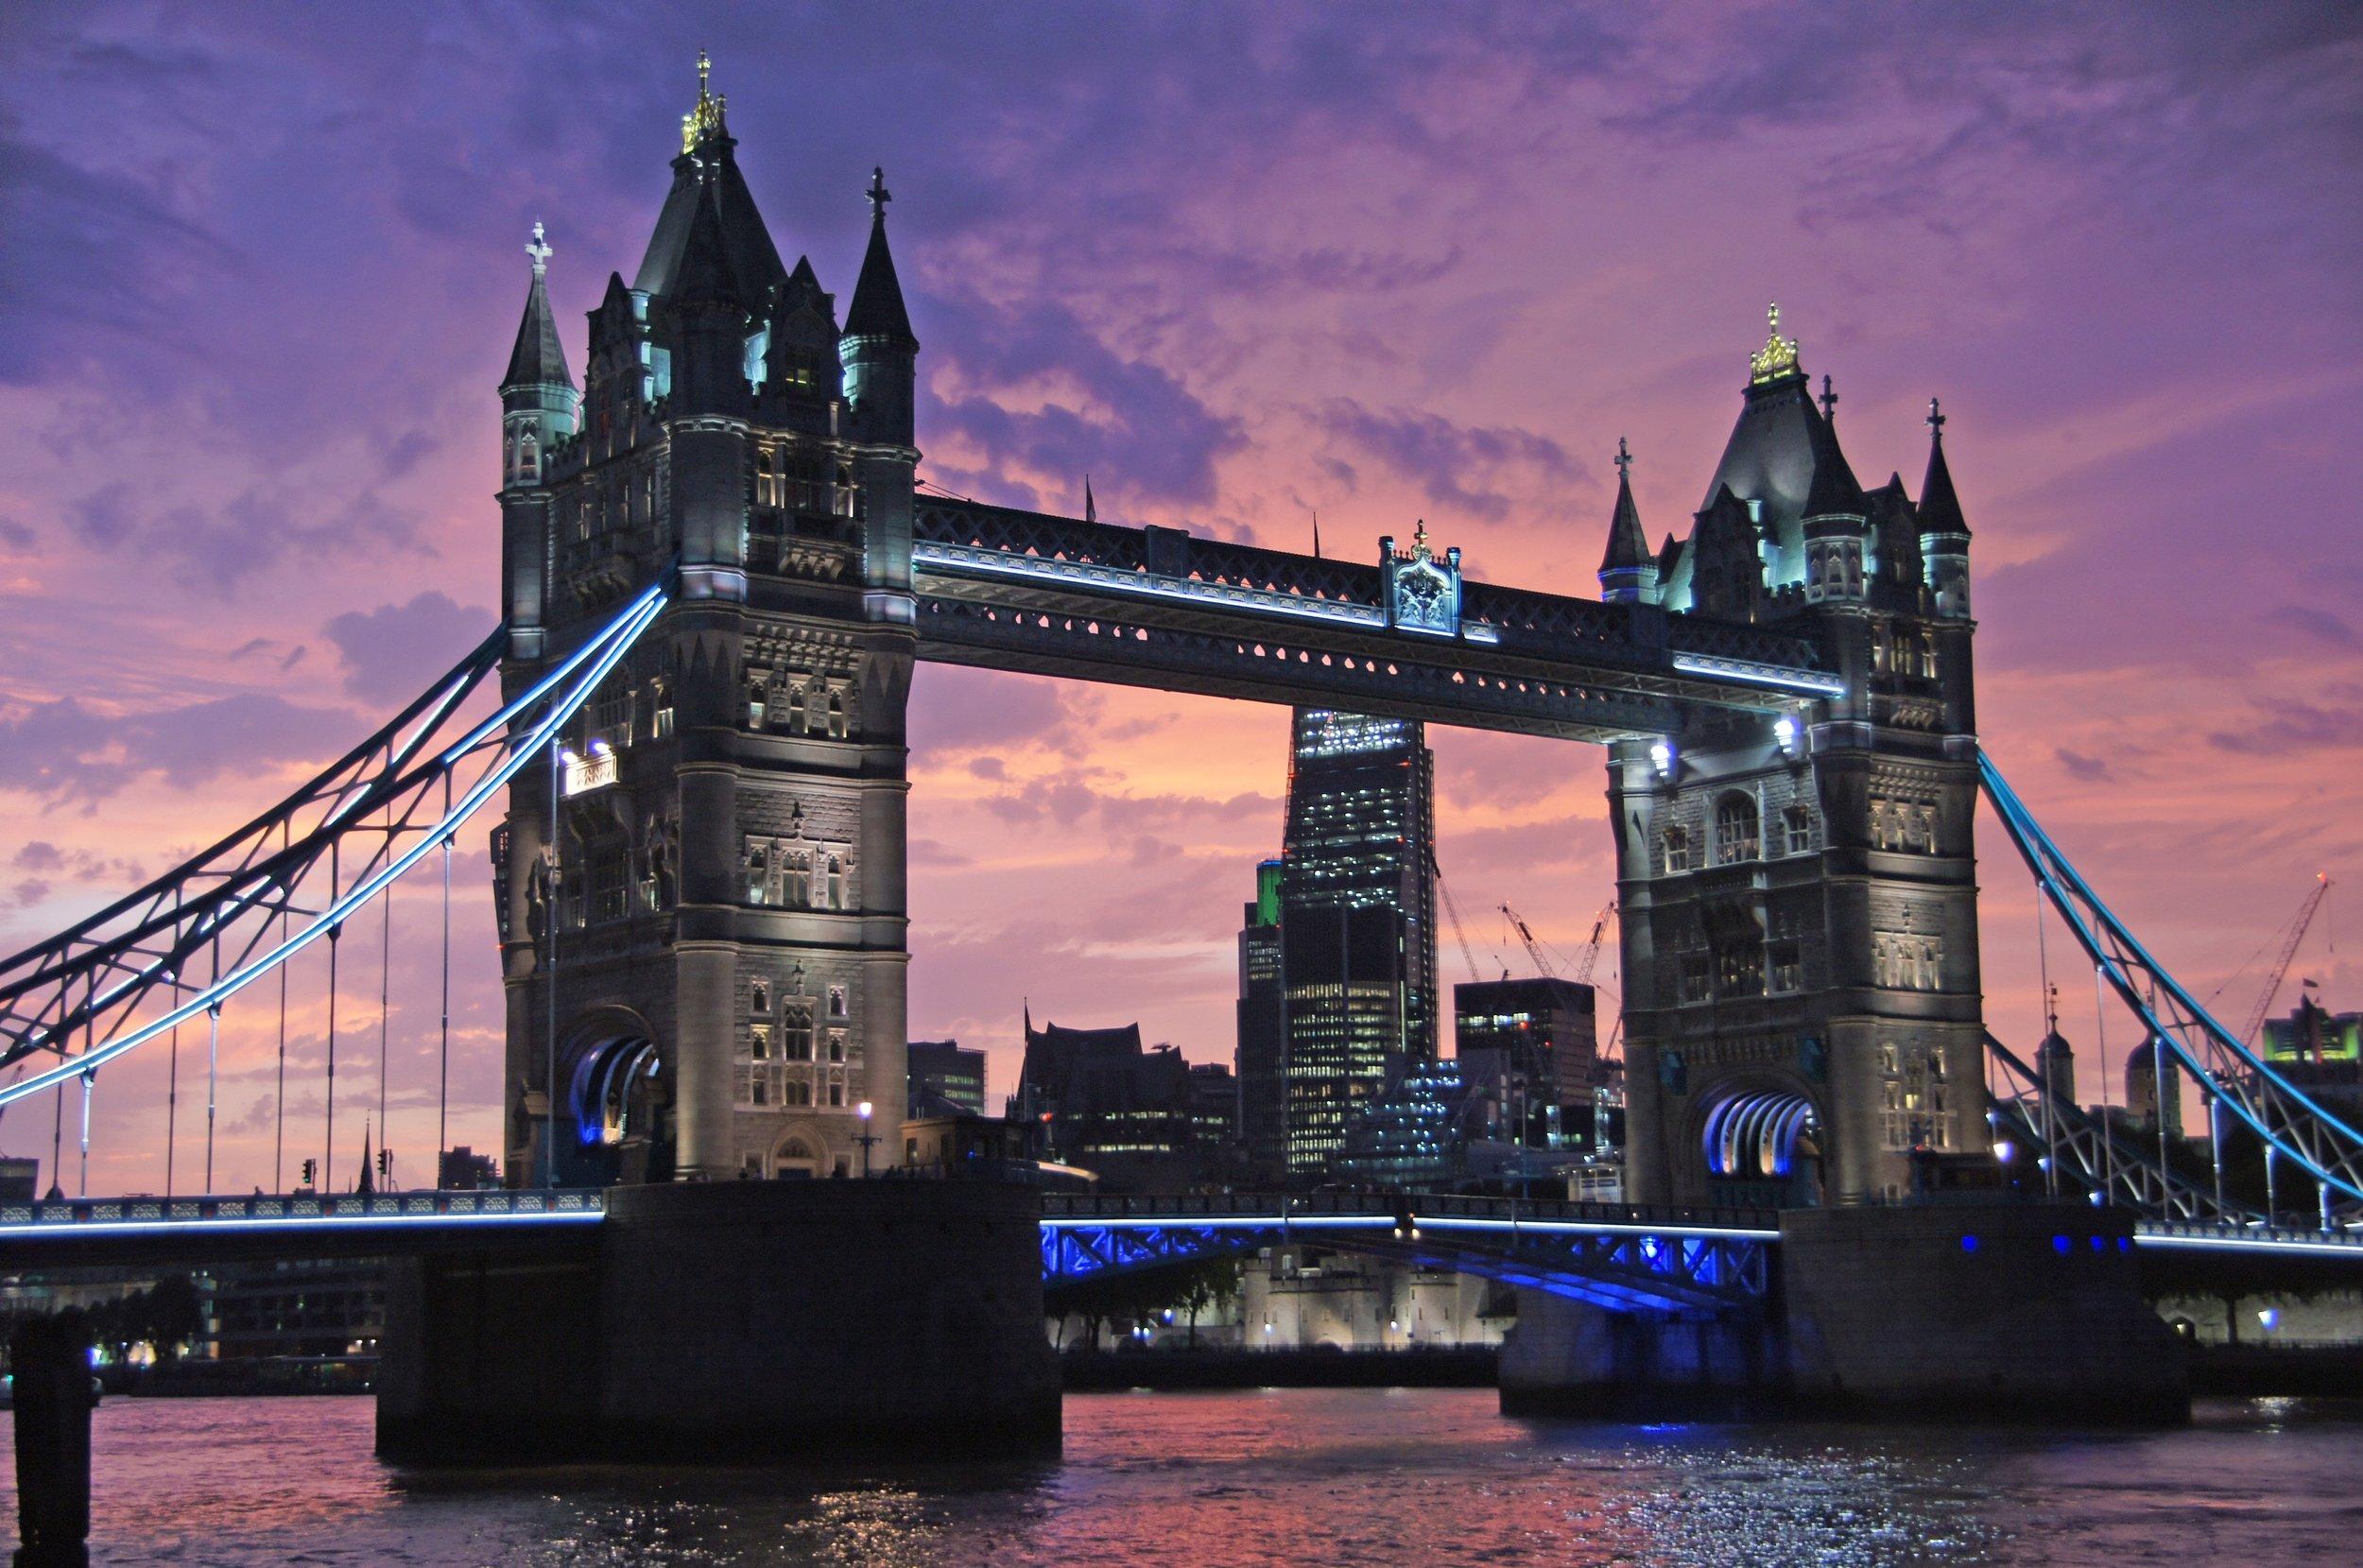 london-tower-bridge-bridge-monument-51363.jpeg